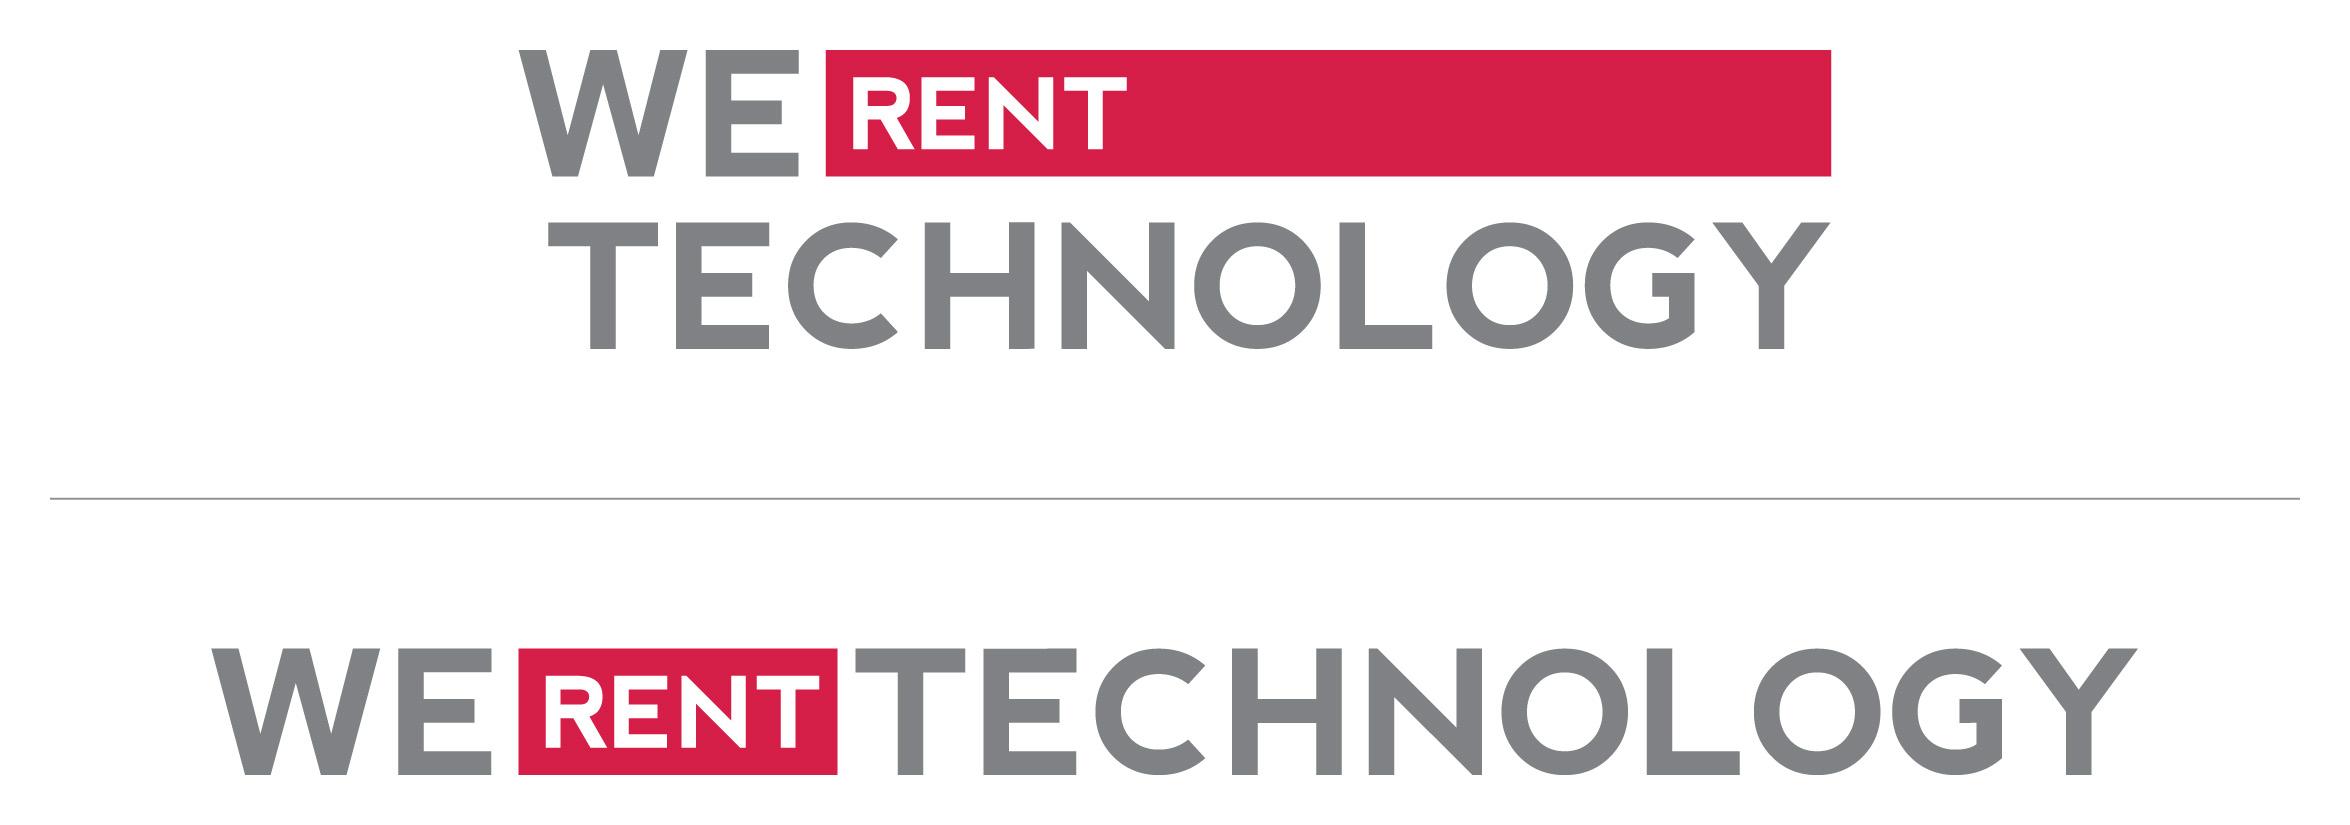 We Rent Technology Logos